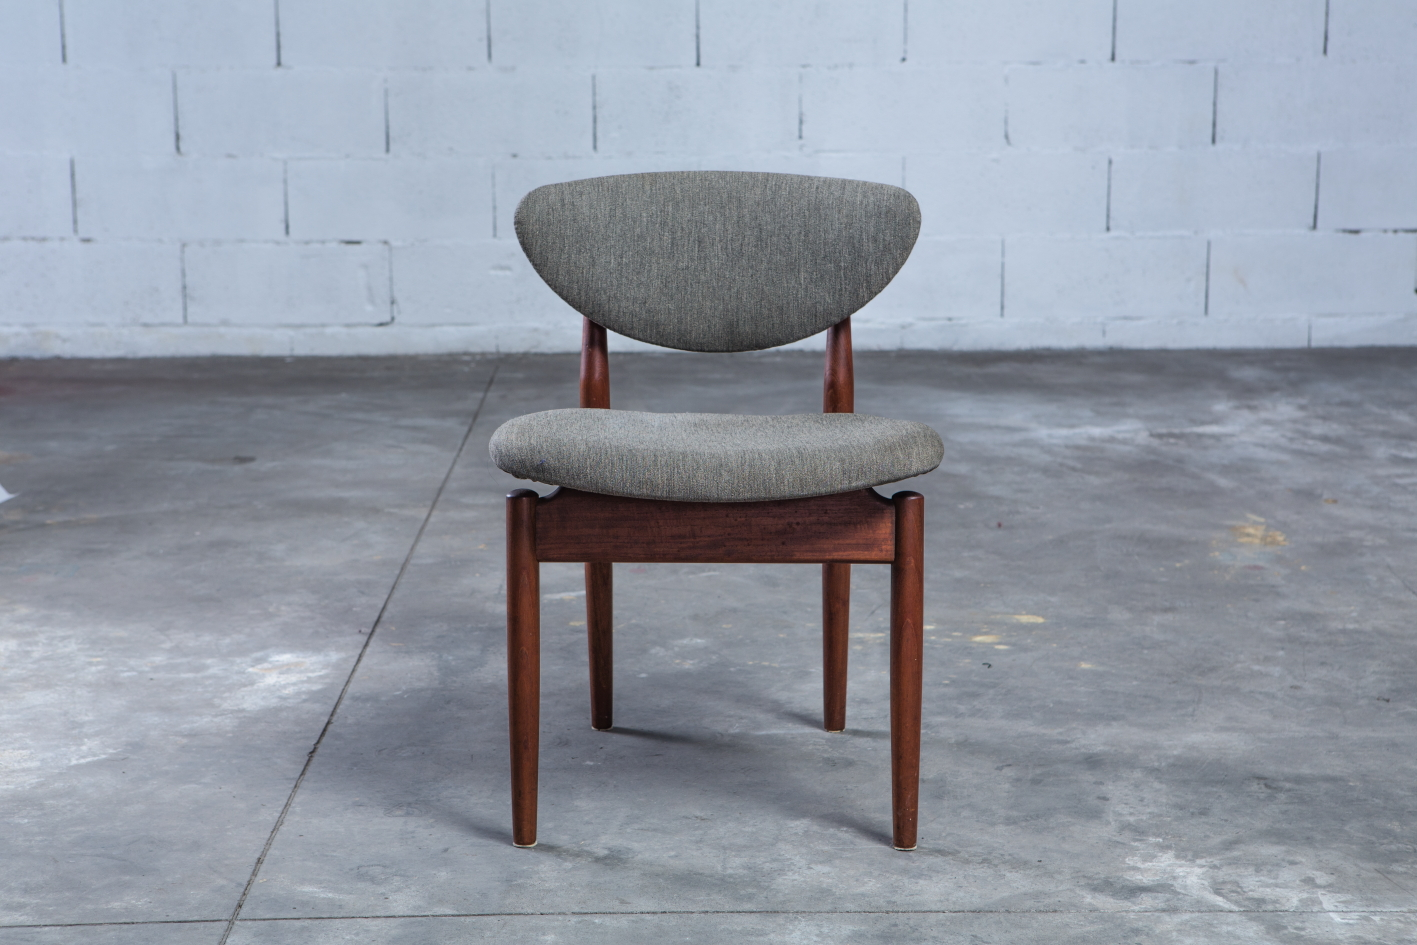 NV108 - Fj55 chairs - Finn Juhl for Niels Vodder - Front view